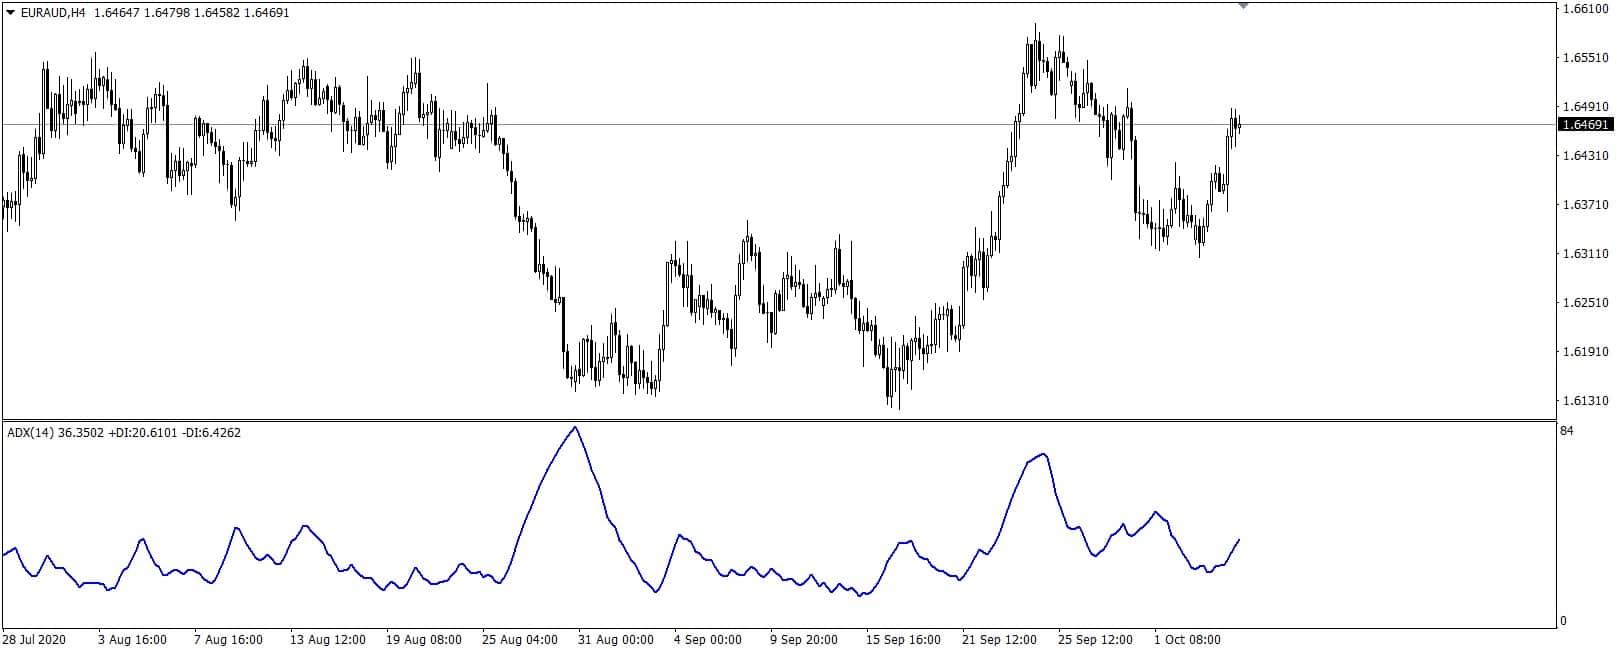 Average directional index indicator MetaTrader 4